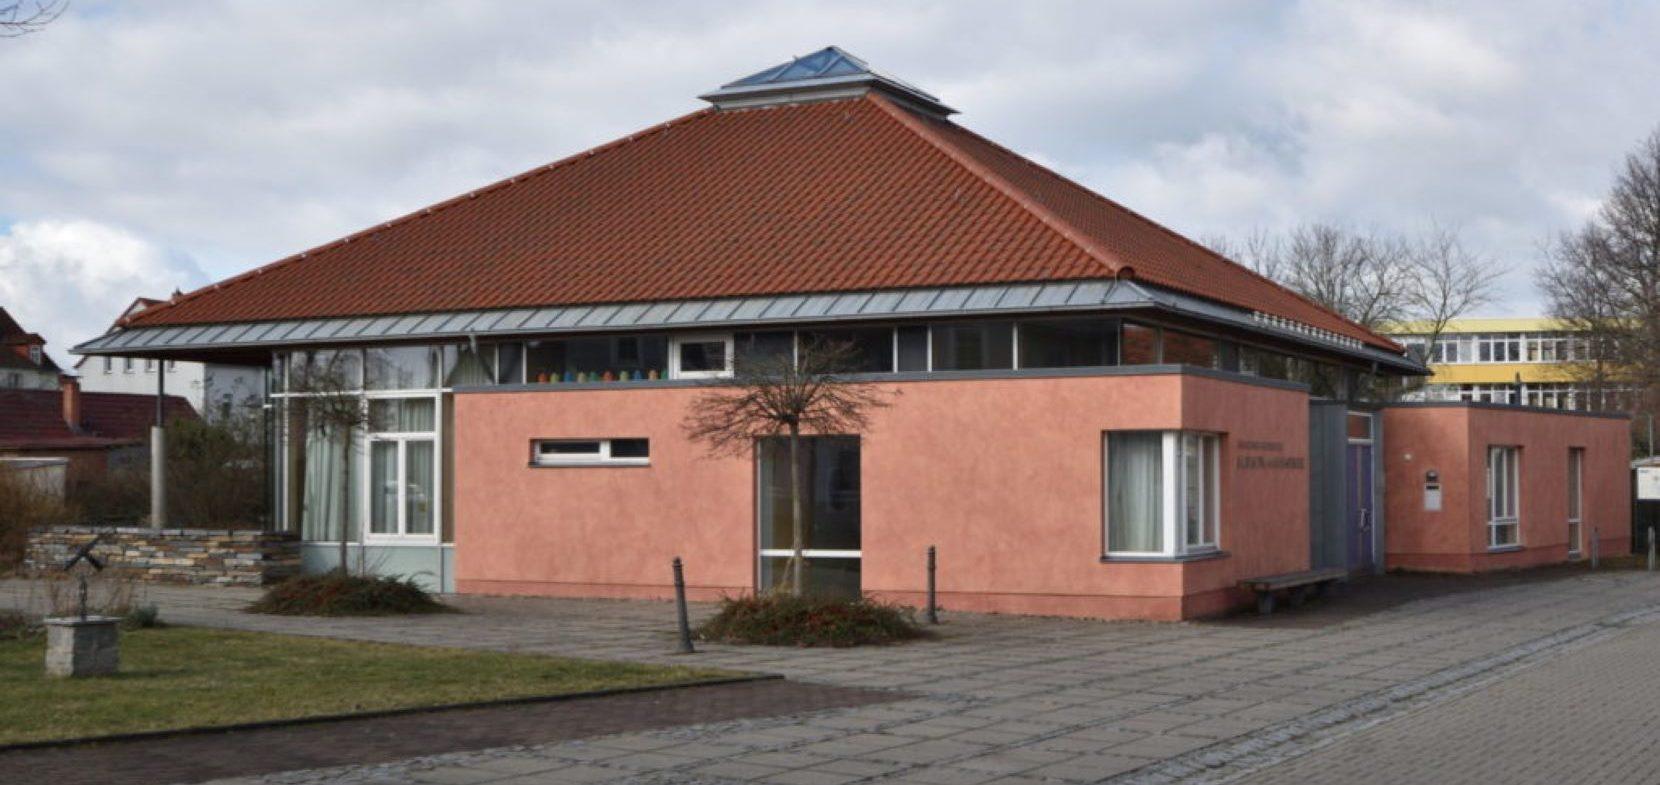 Katharina-von-Bora-Kirche in Neukieritzsch